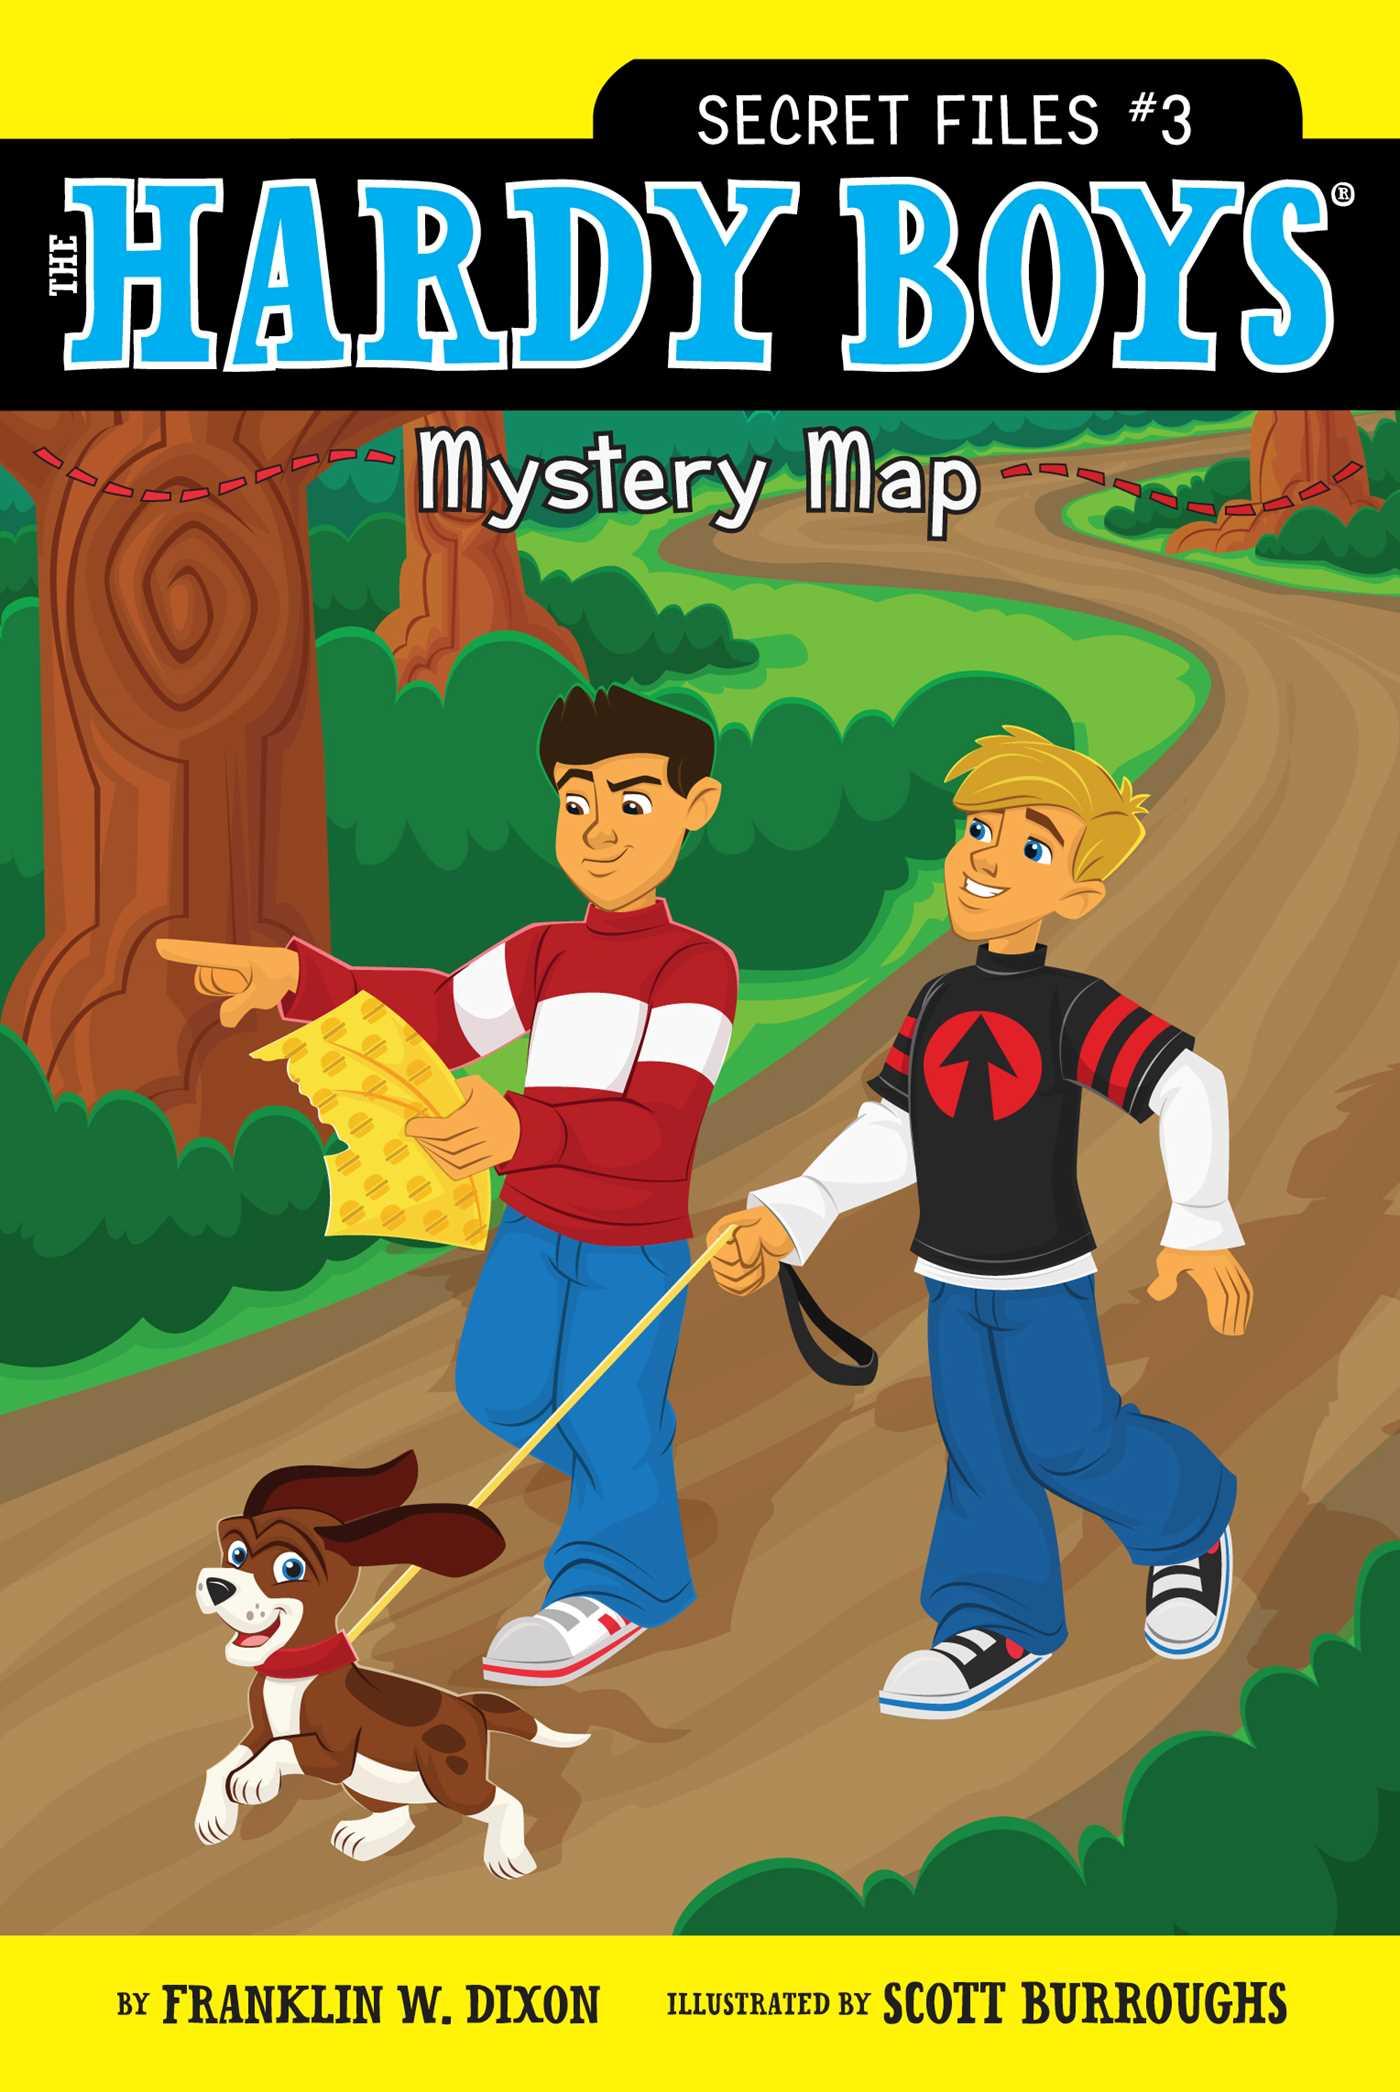 Mystery map 9781442407190 hr